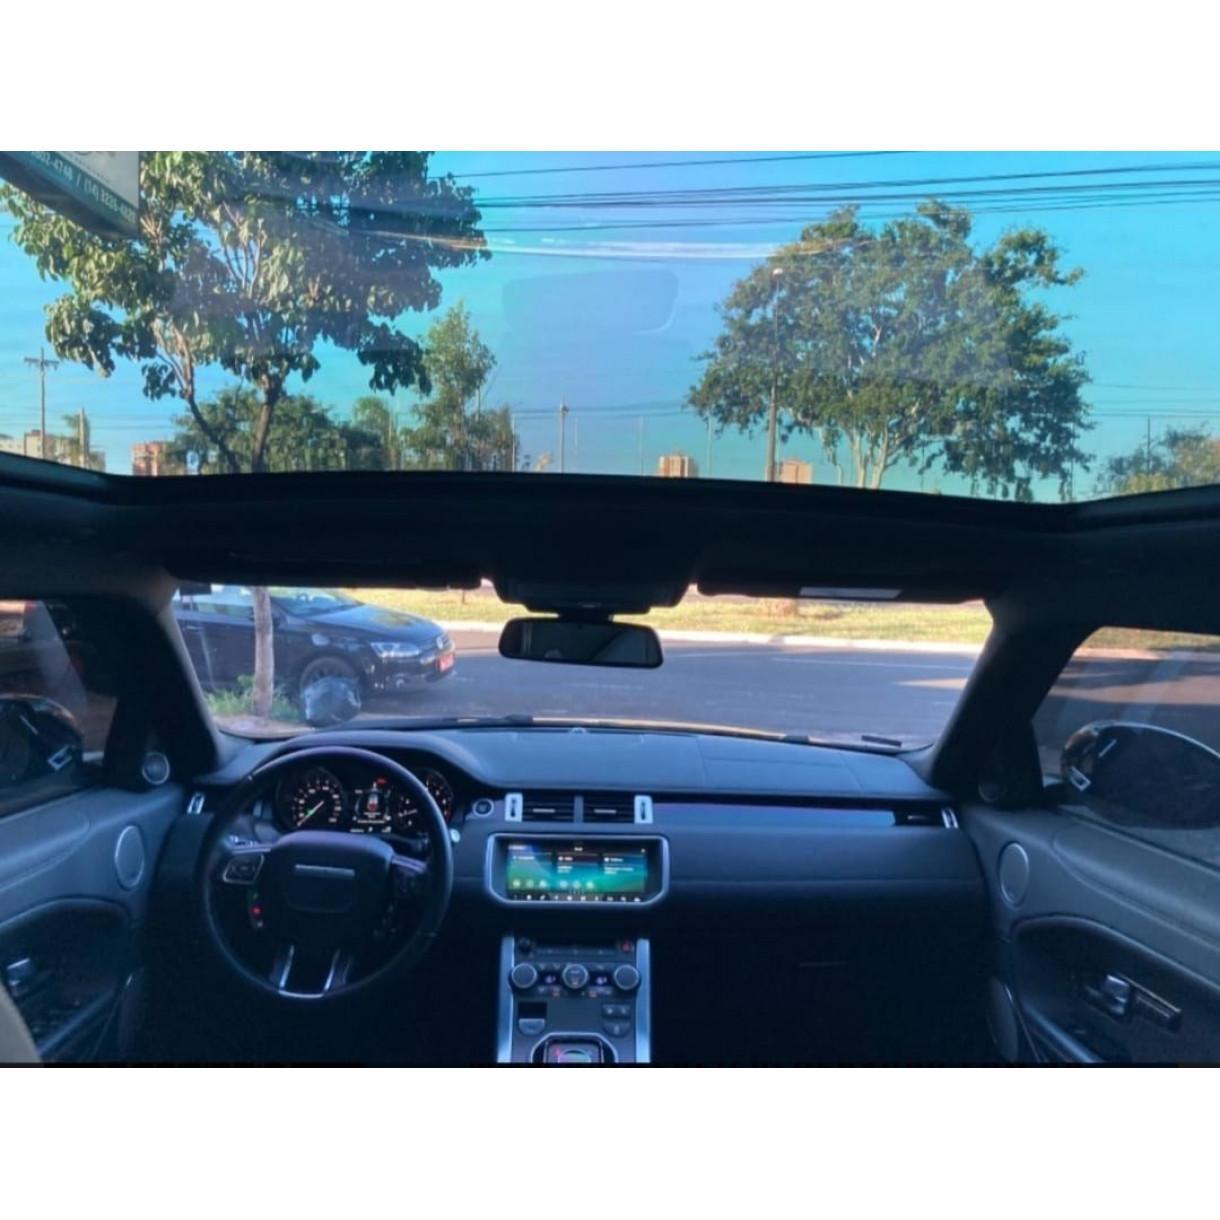 LAND ROVER Range Rover Evoque 2.0 16V 4P HSE 4WD DYNAMIC AUTOMÁTICO, Foto 12